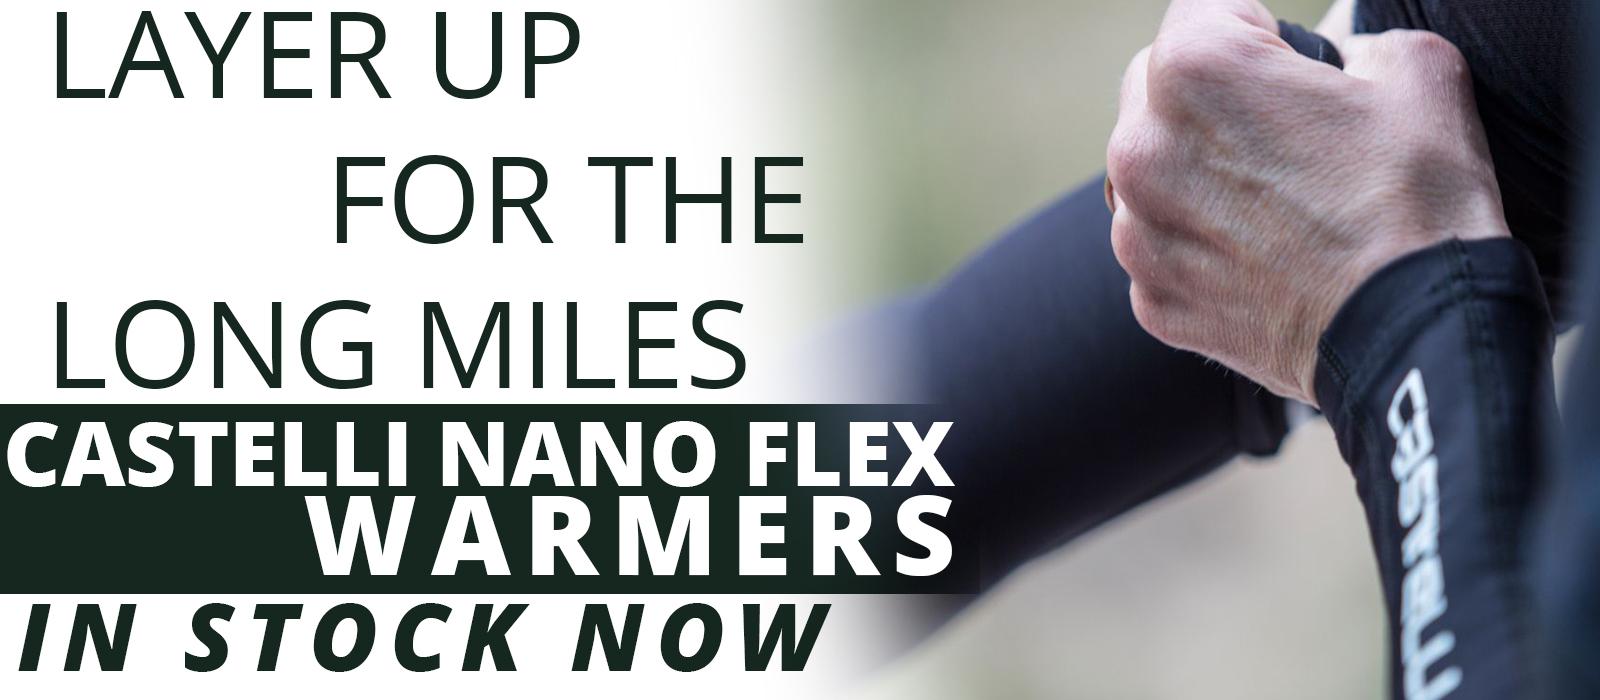 Nano Flex Arm warmers